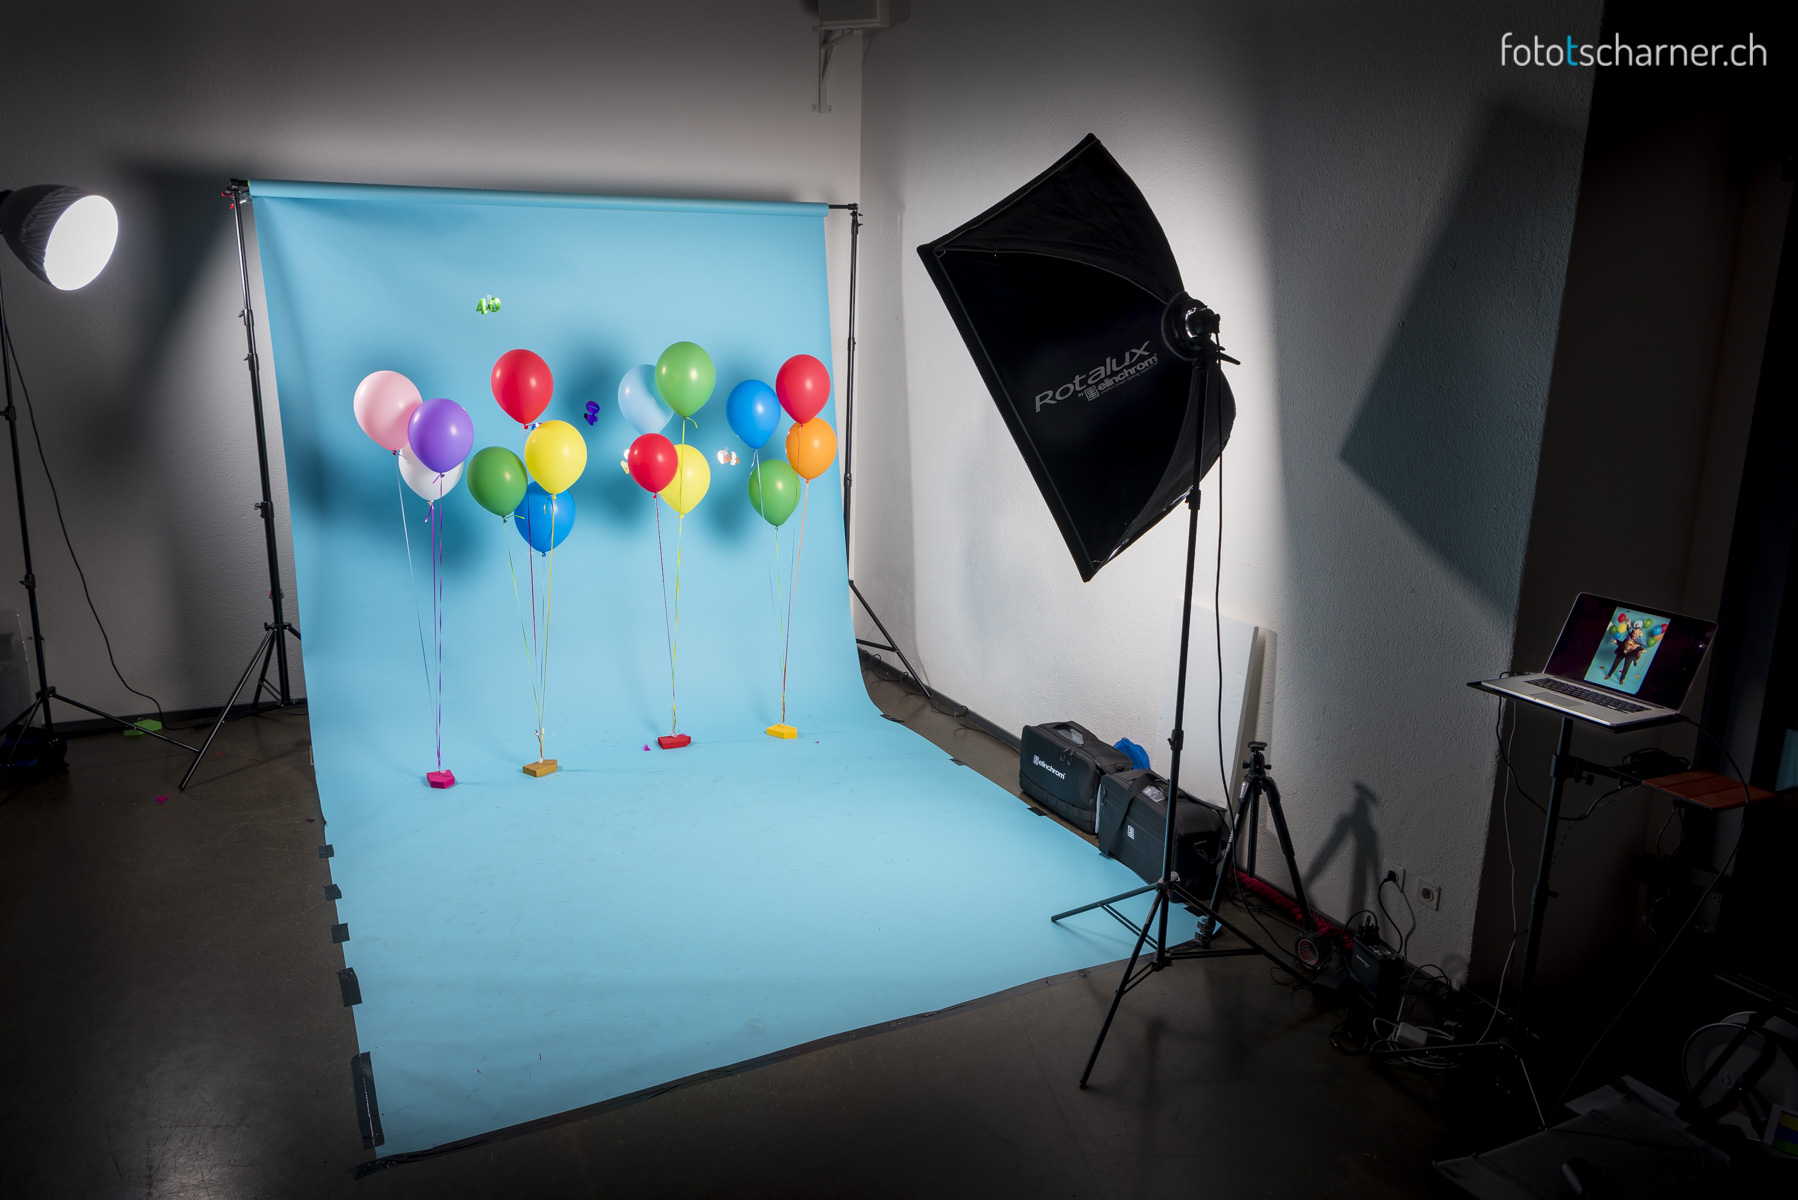 Studio-Fotosession Brun 80 years_fototscharner.ch_-170617_Capture0014-6